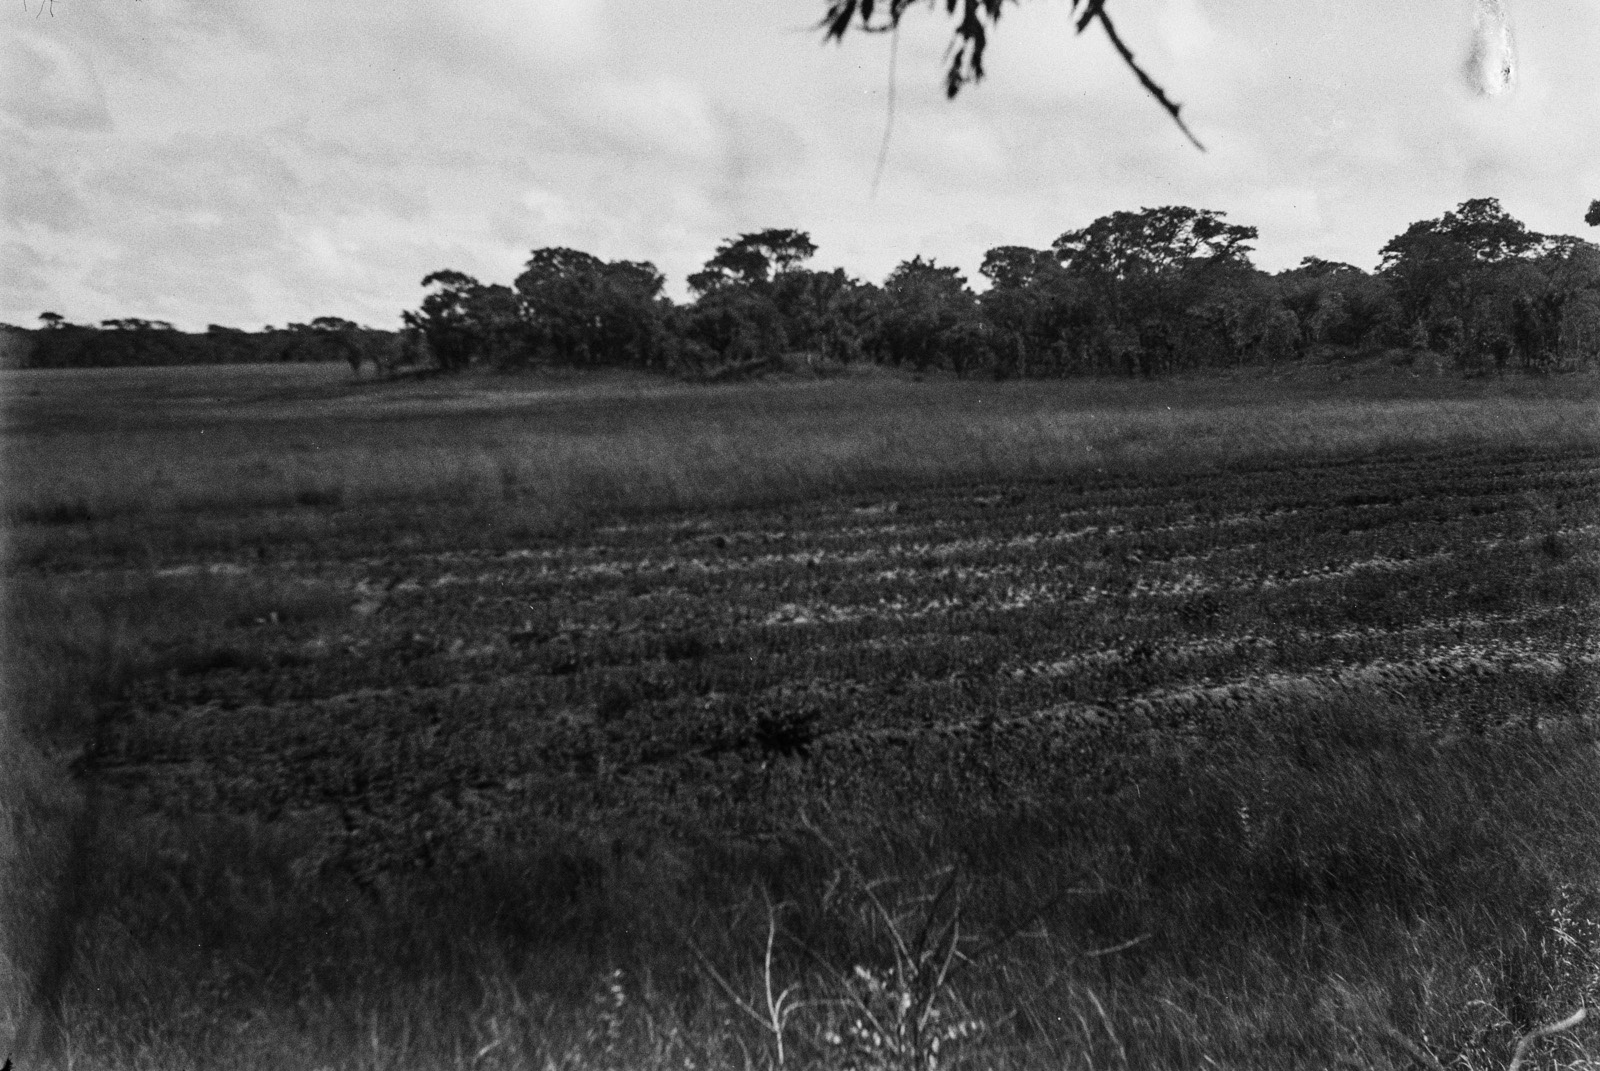 Между Капири Мпоши и рекой Лунсемфва. Поле в дамбо, на котором растут растения, похожие на спаржу